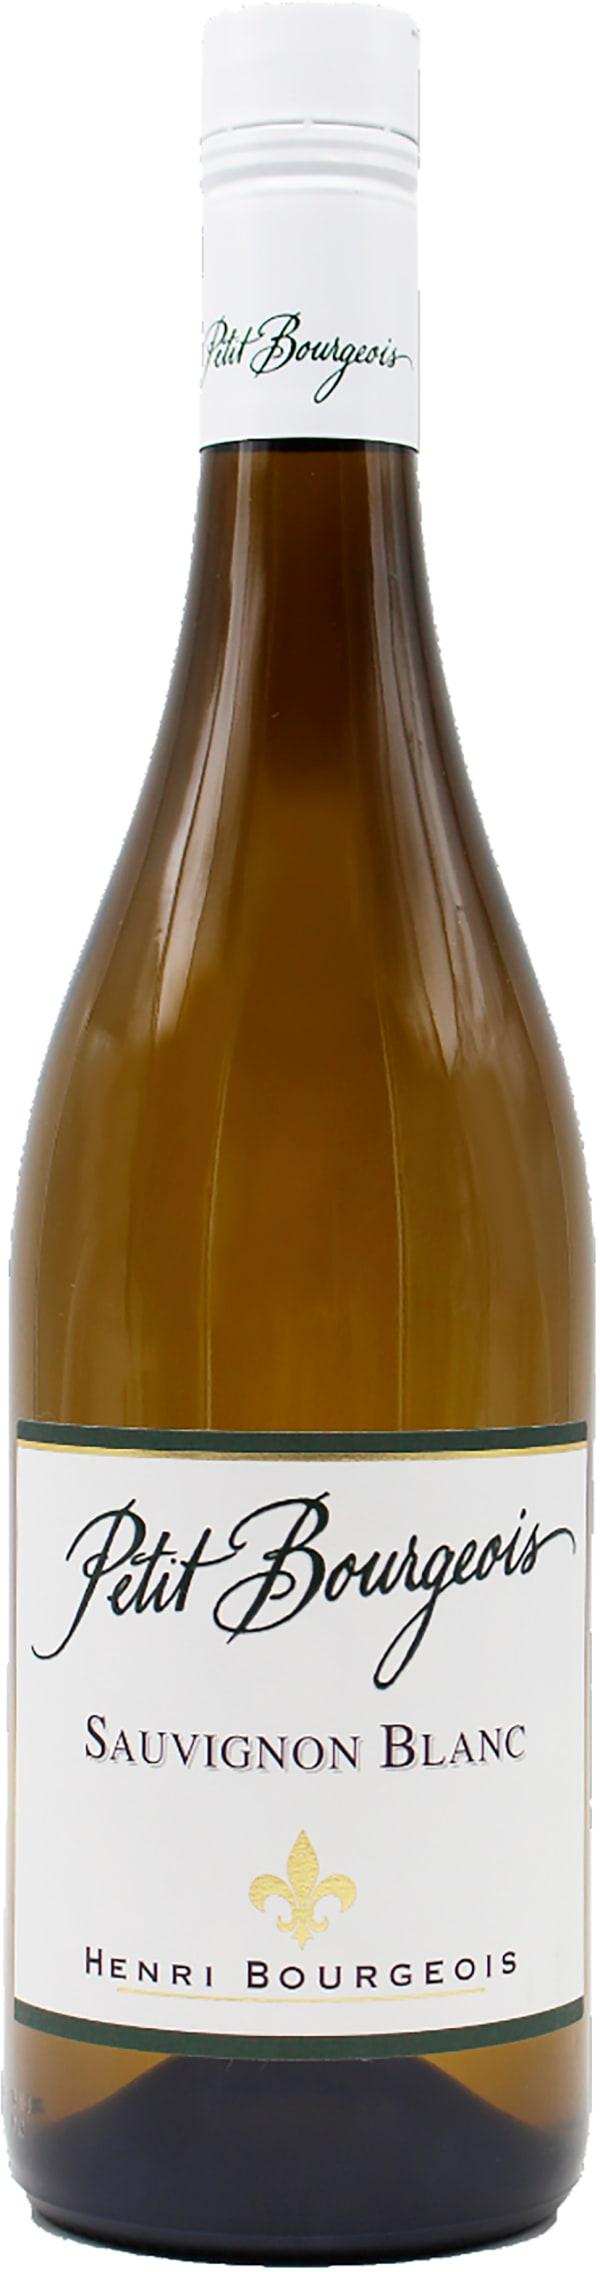 Petit Bourgeois Sauvignon Blanc 2017